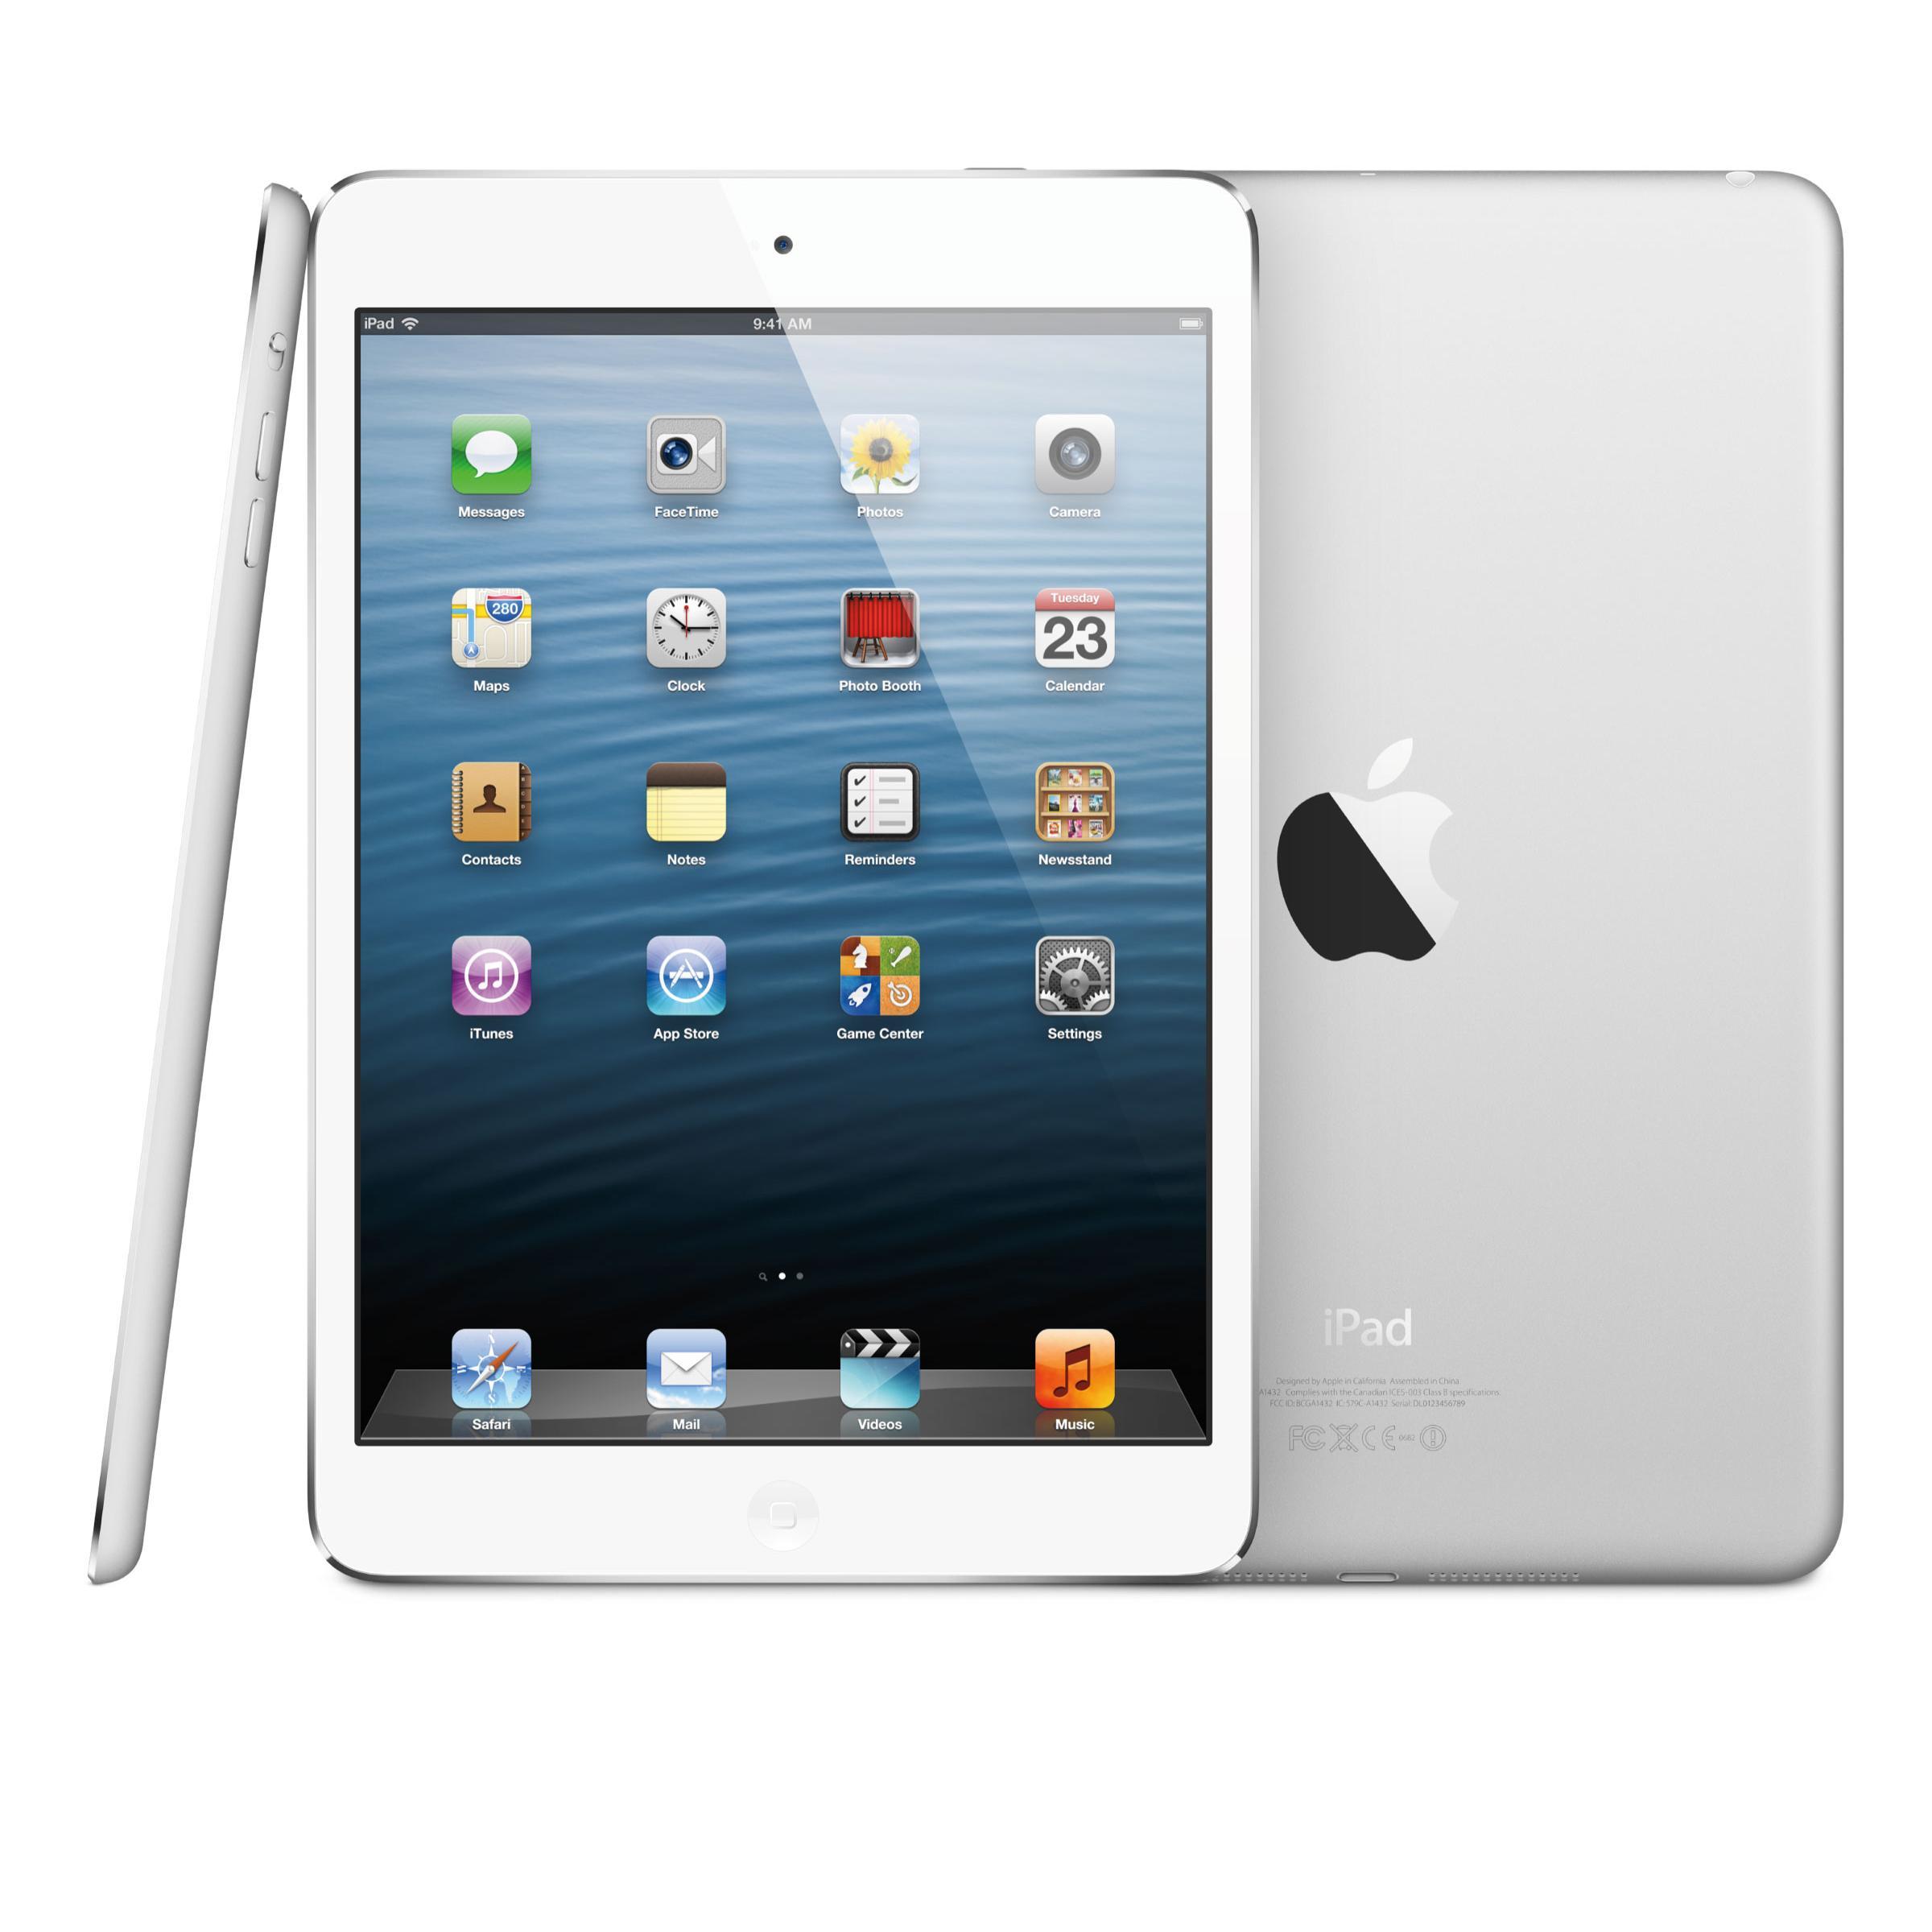 iPad 2 16 Go Wifi + 3G - Blanc - Débloqué